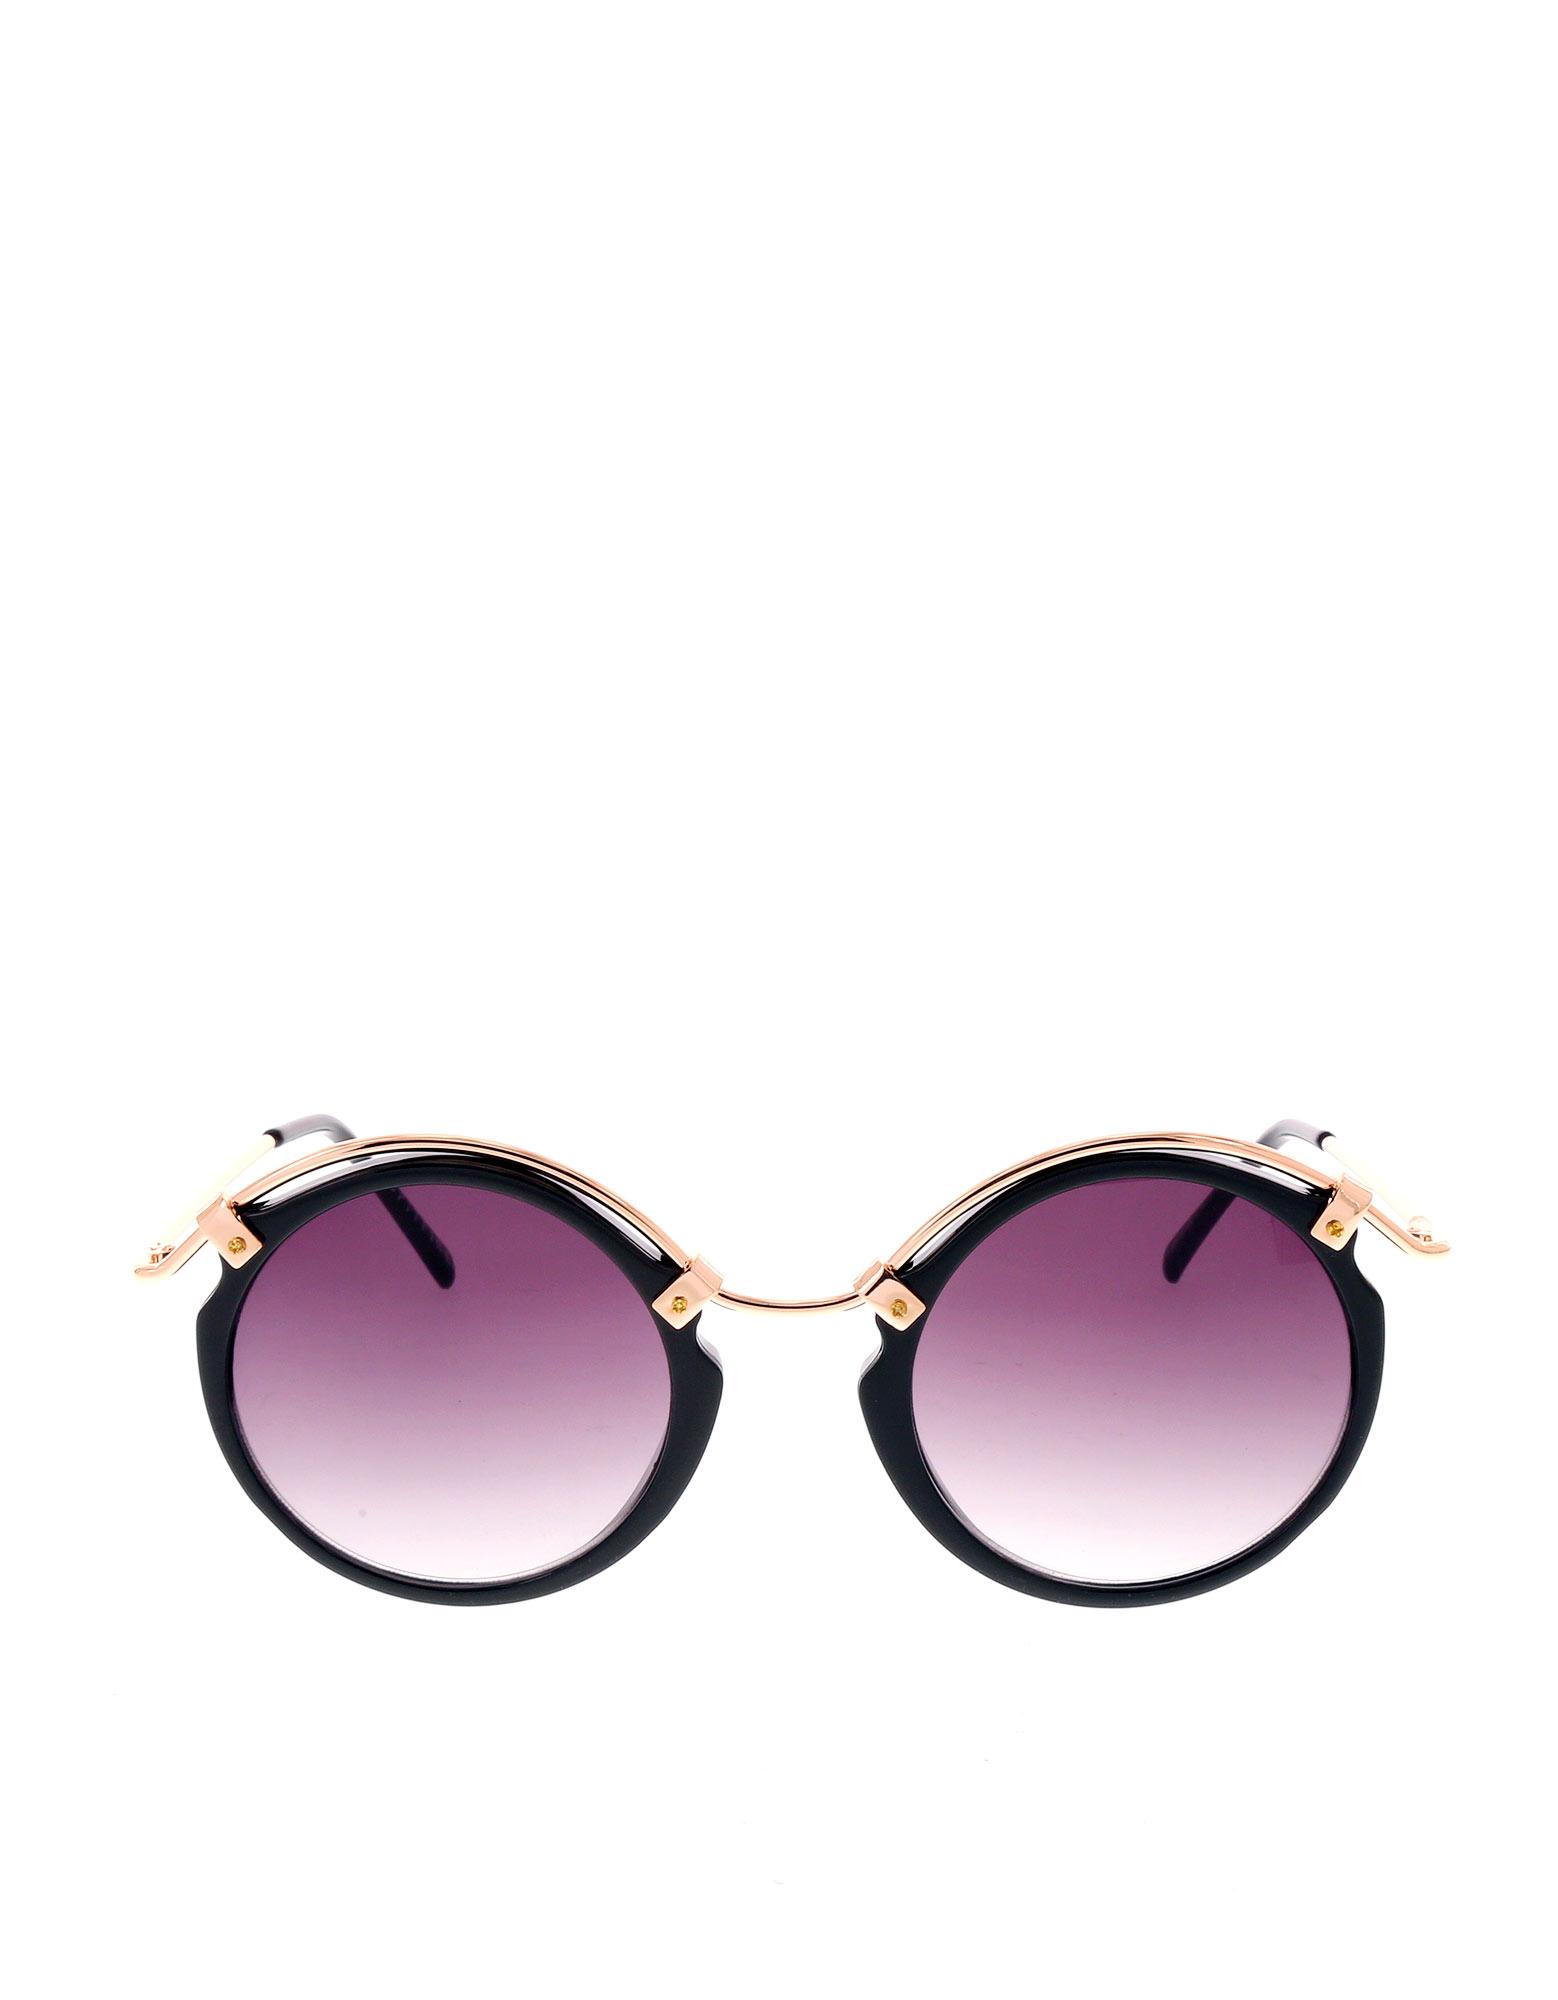 Spitfire Uk A-Teen Black/Gold/Black Sunglasses